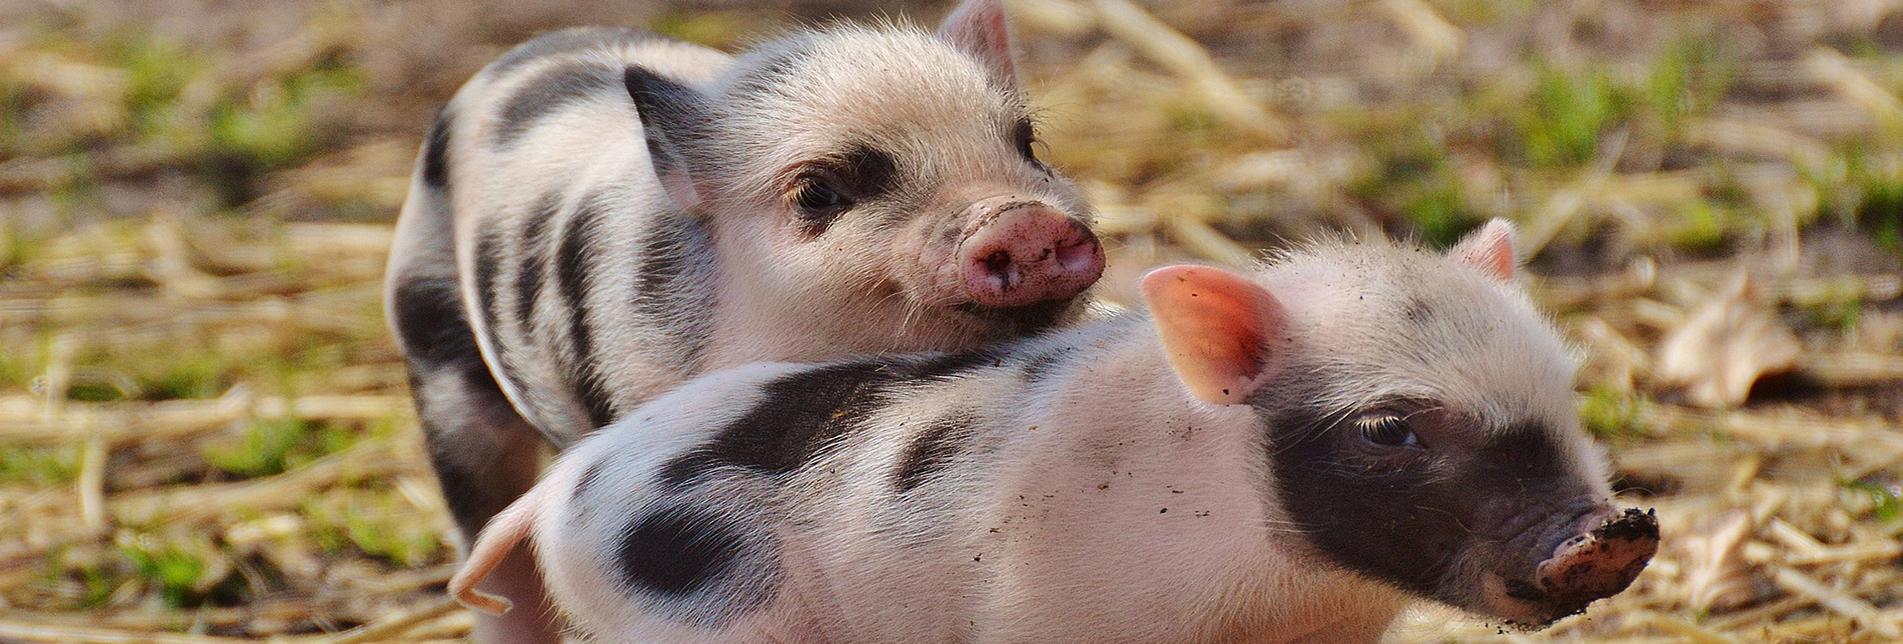 HERE PIGGY PIGGY…I NEED TO BORROW AN ORGAN